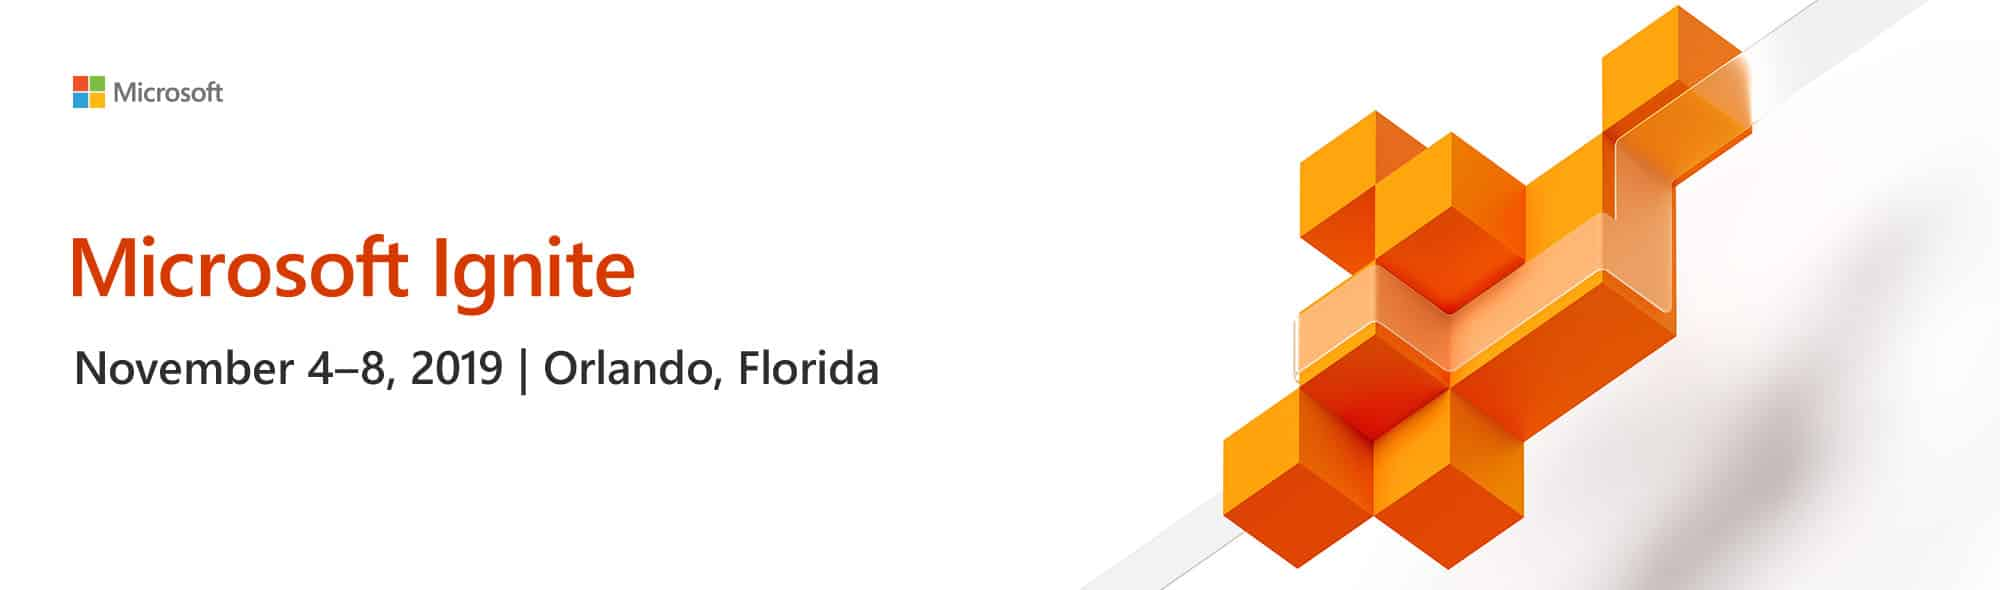 Microsoft Ignite 2019 Orlando